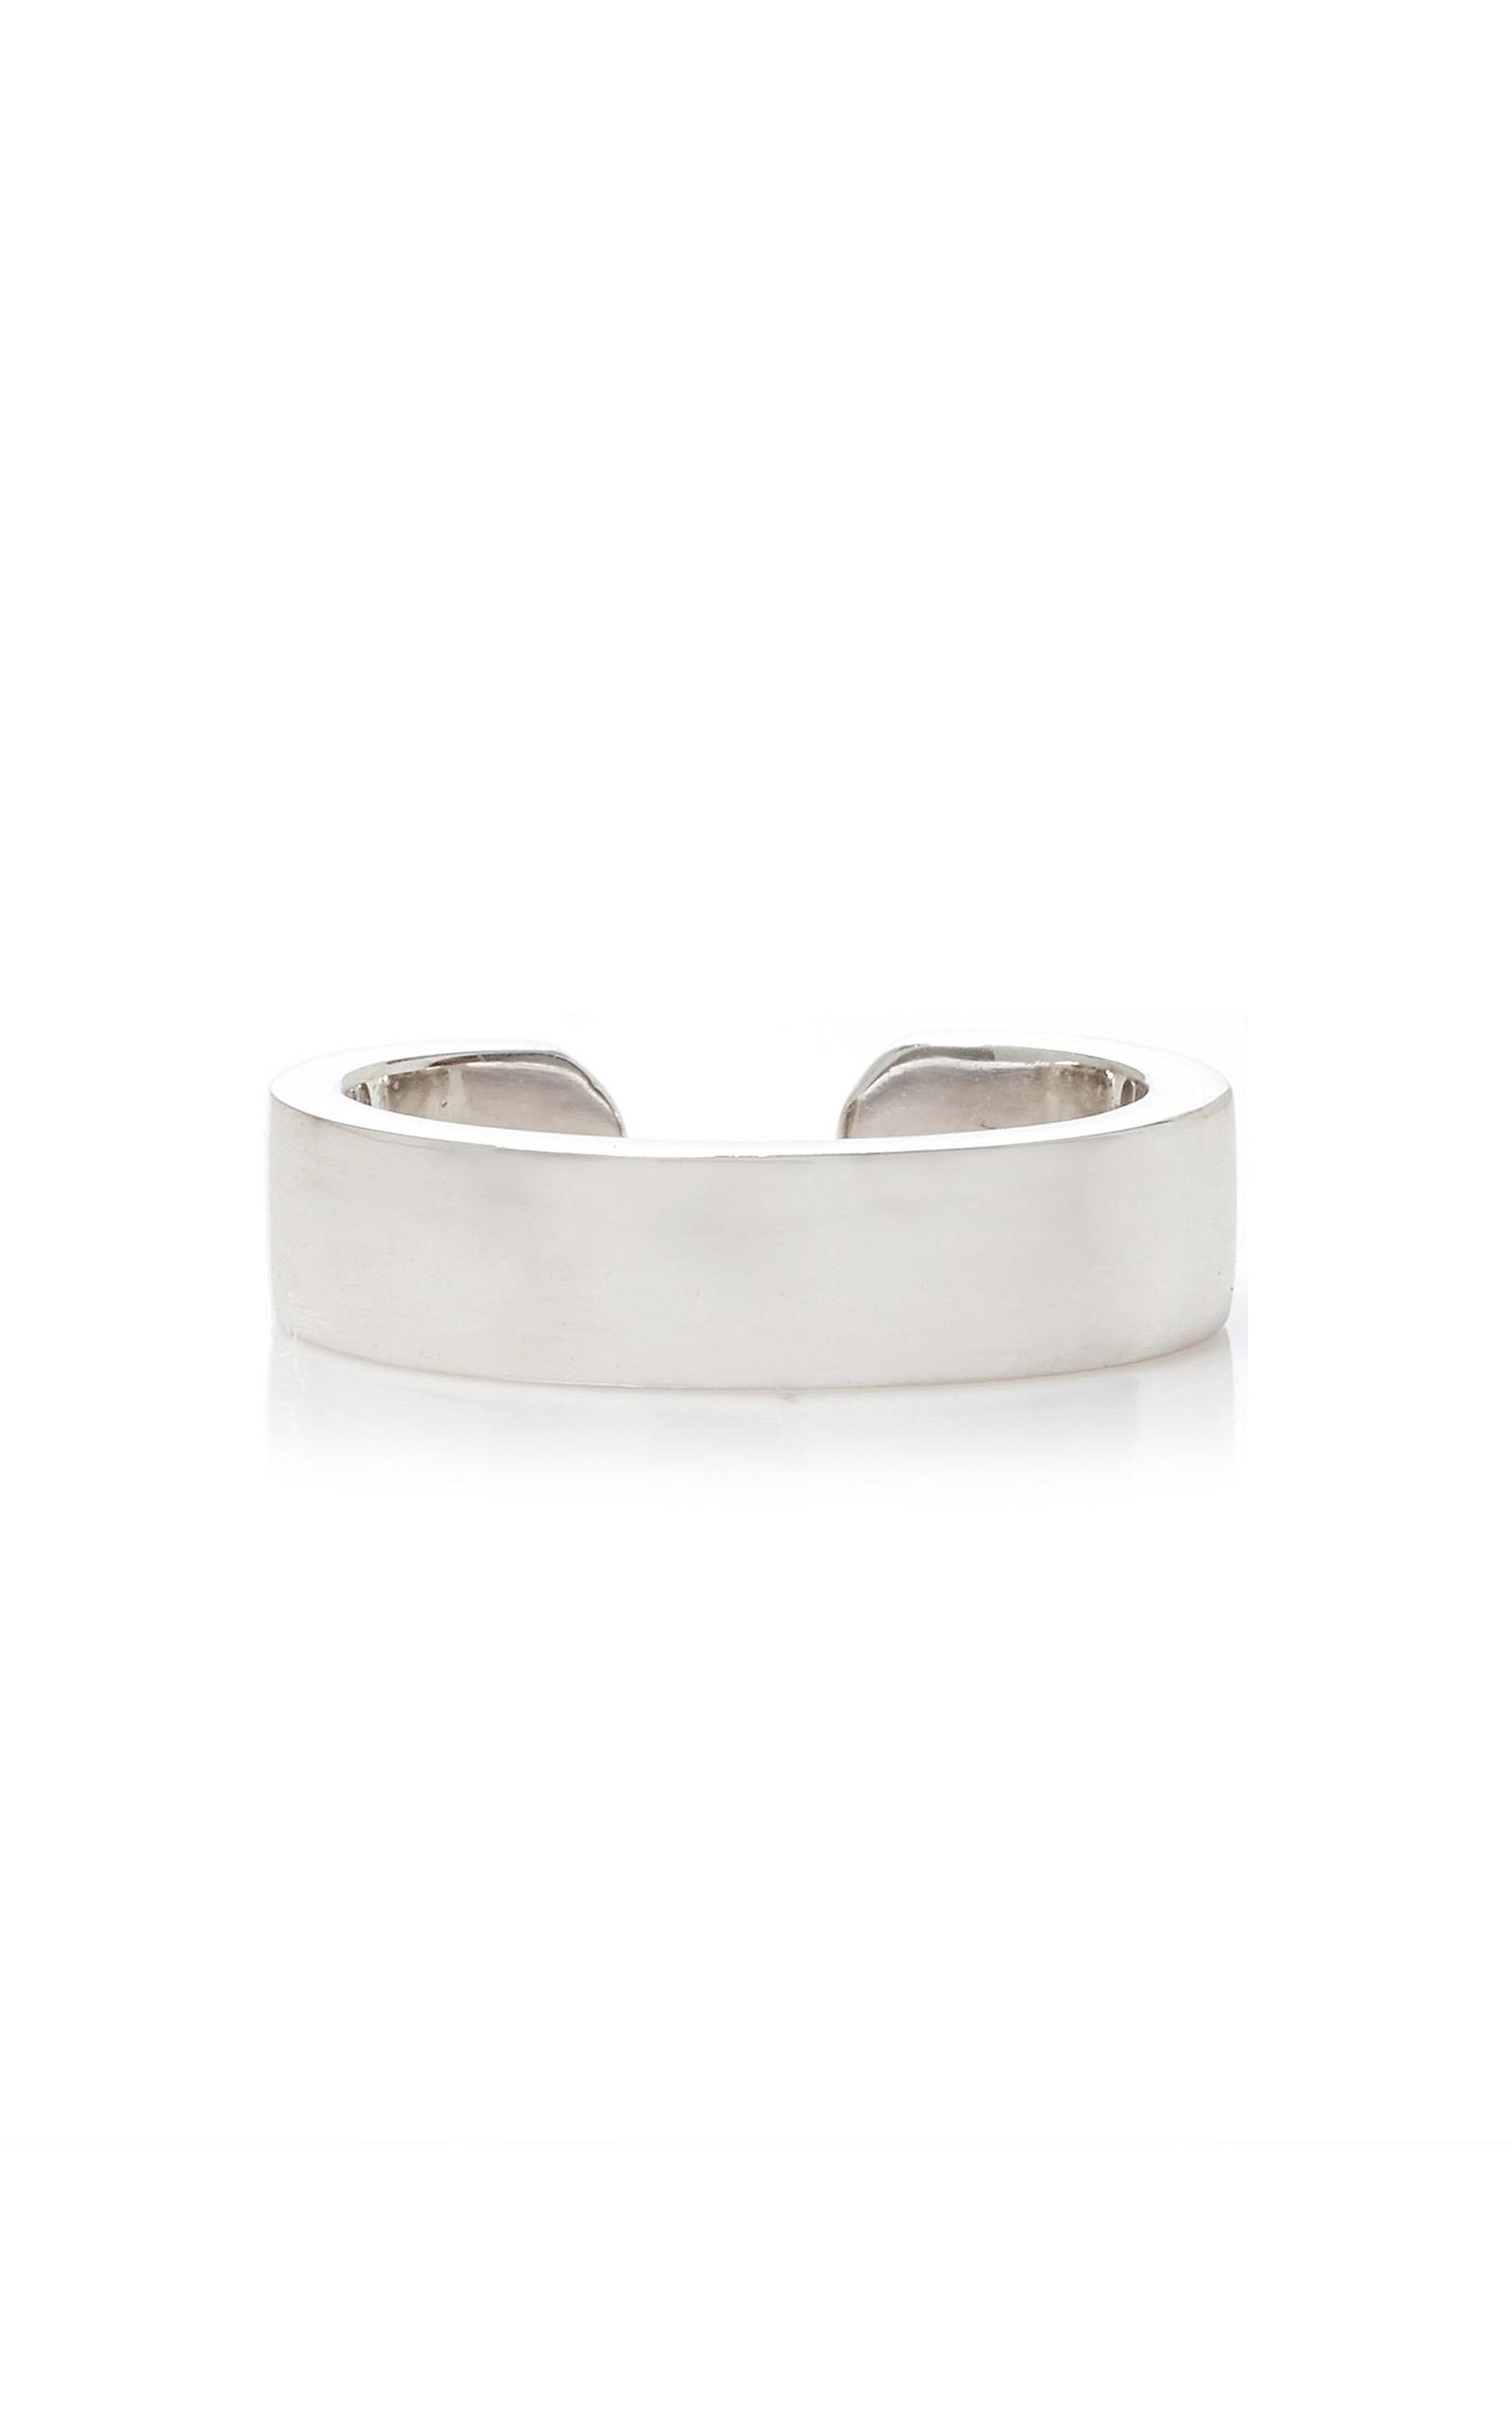 b7a6bd8ad Double Row Plain Ear Cuff by Anita Ko | Moda Operandi